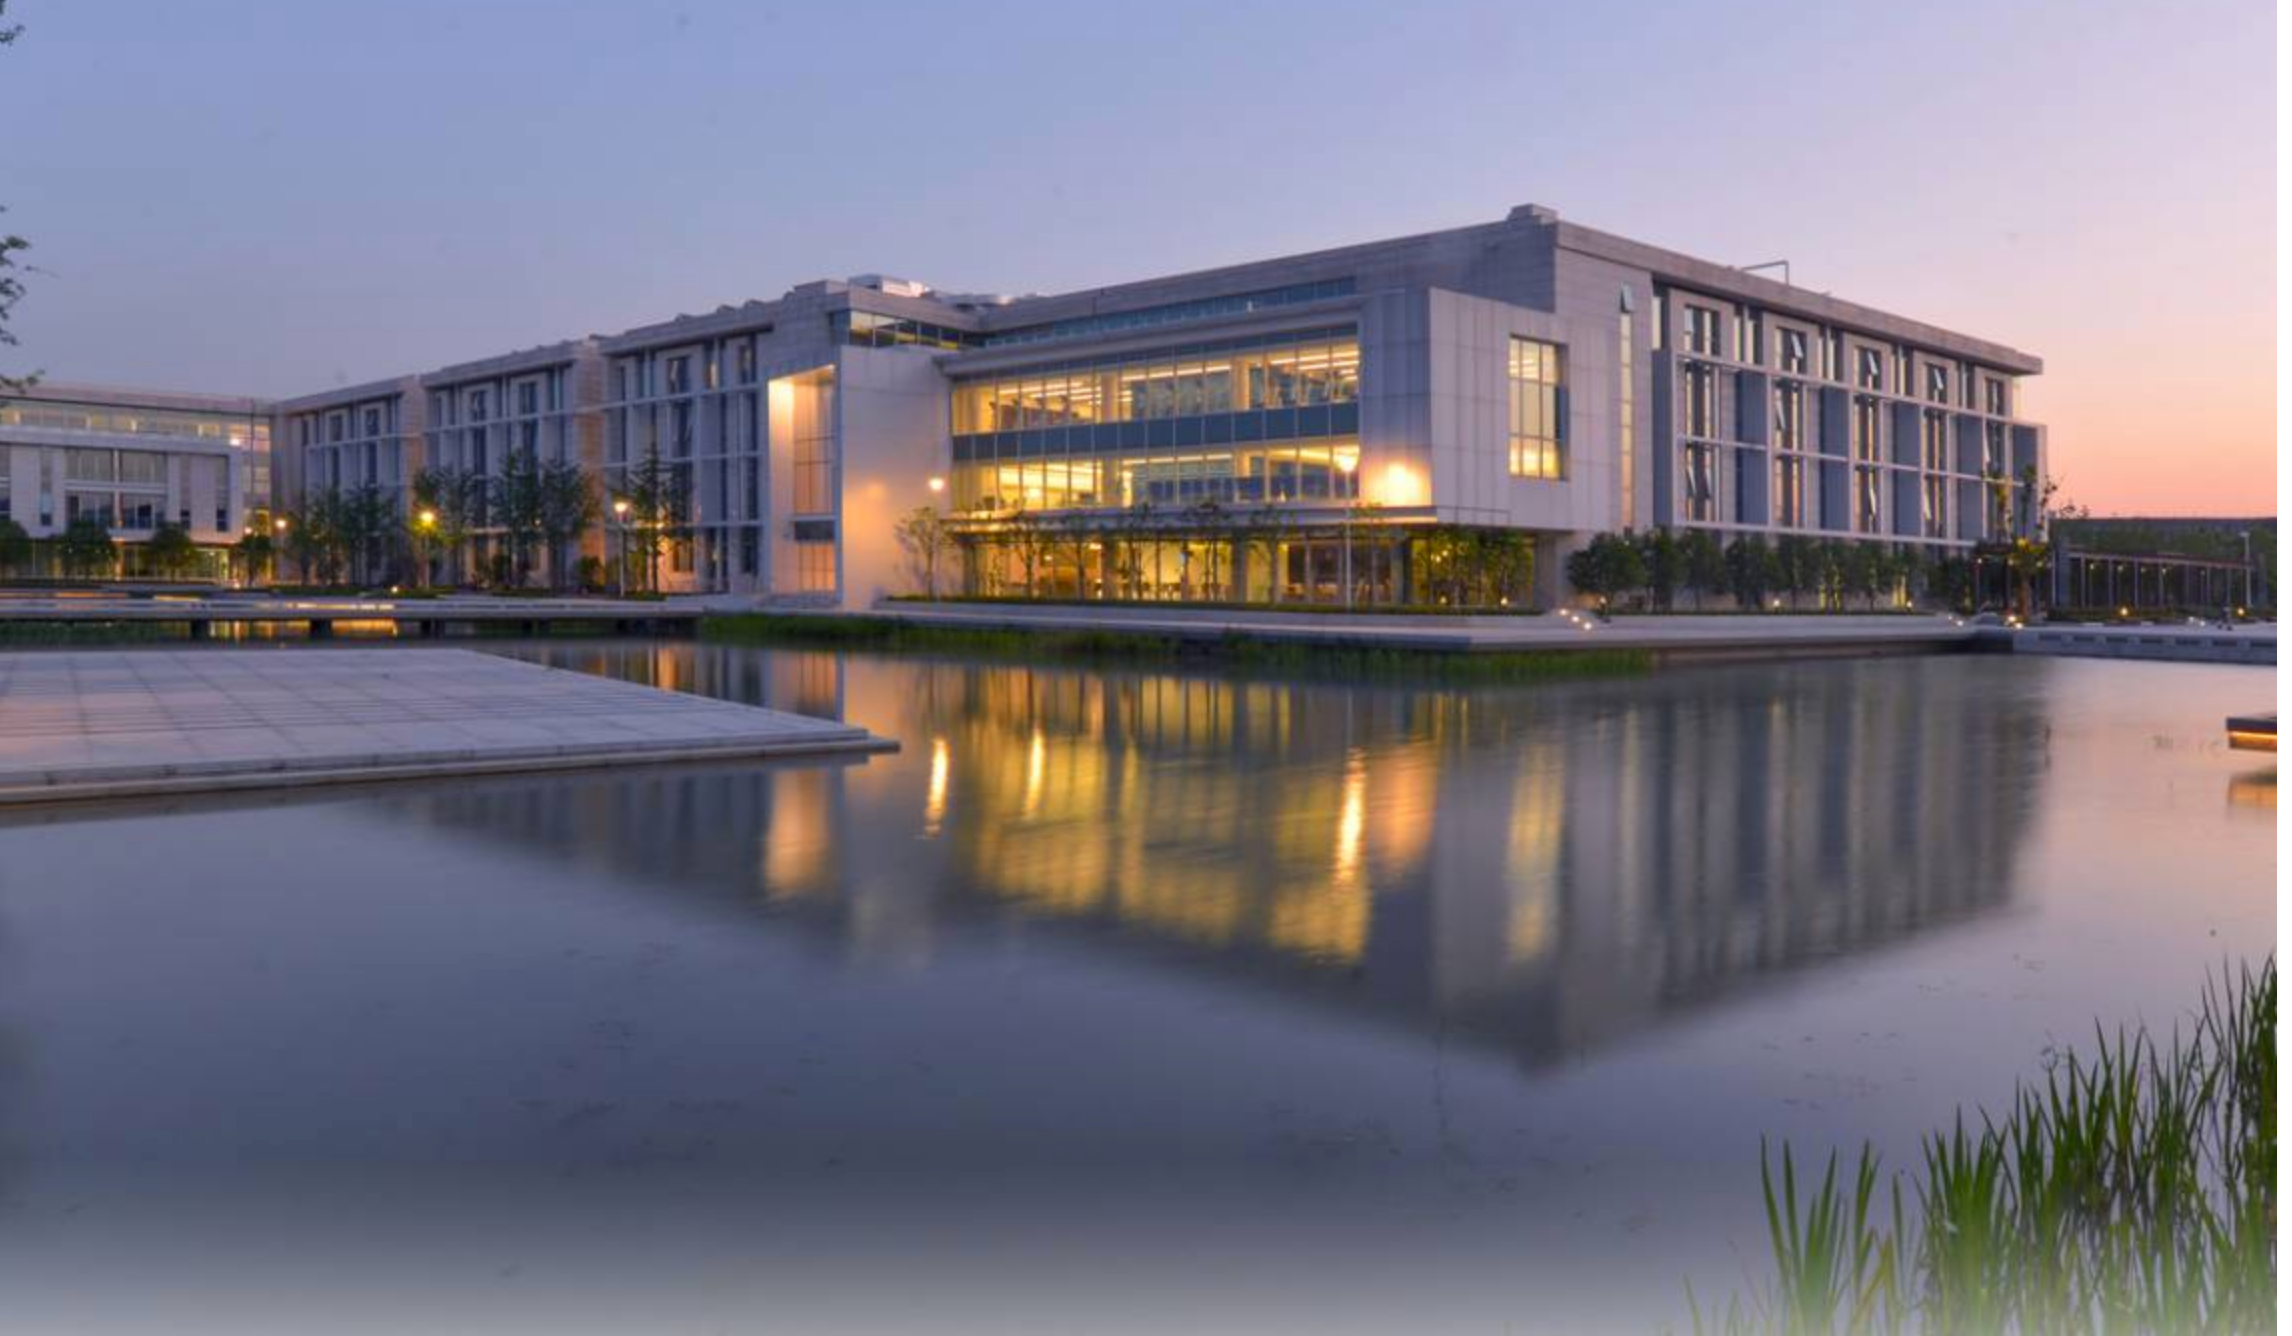 Duke Kunshan campus in China